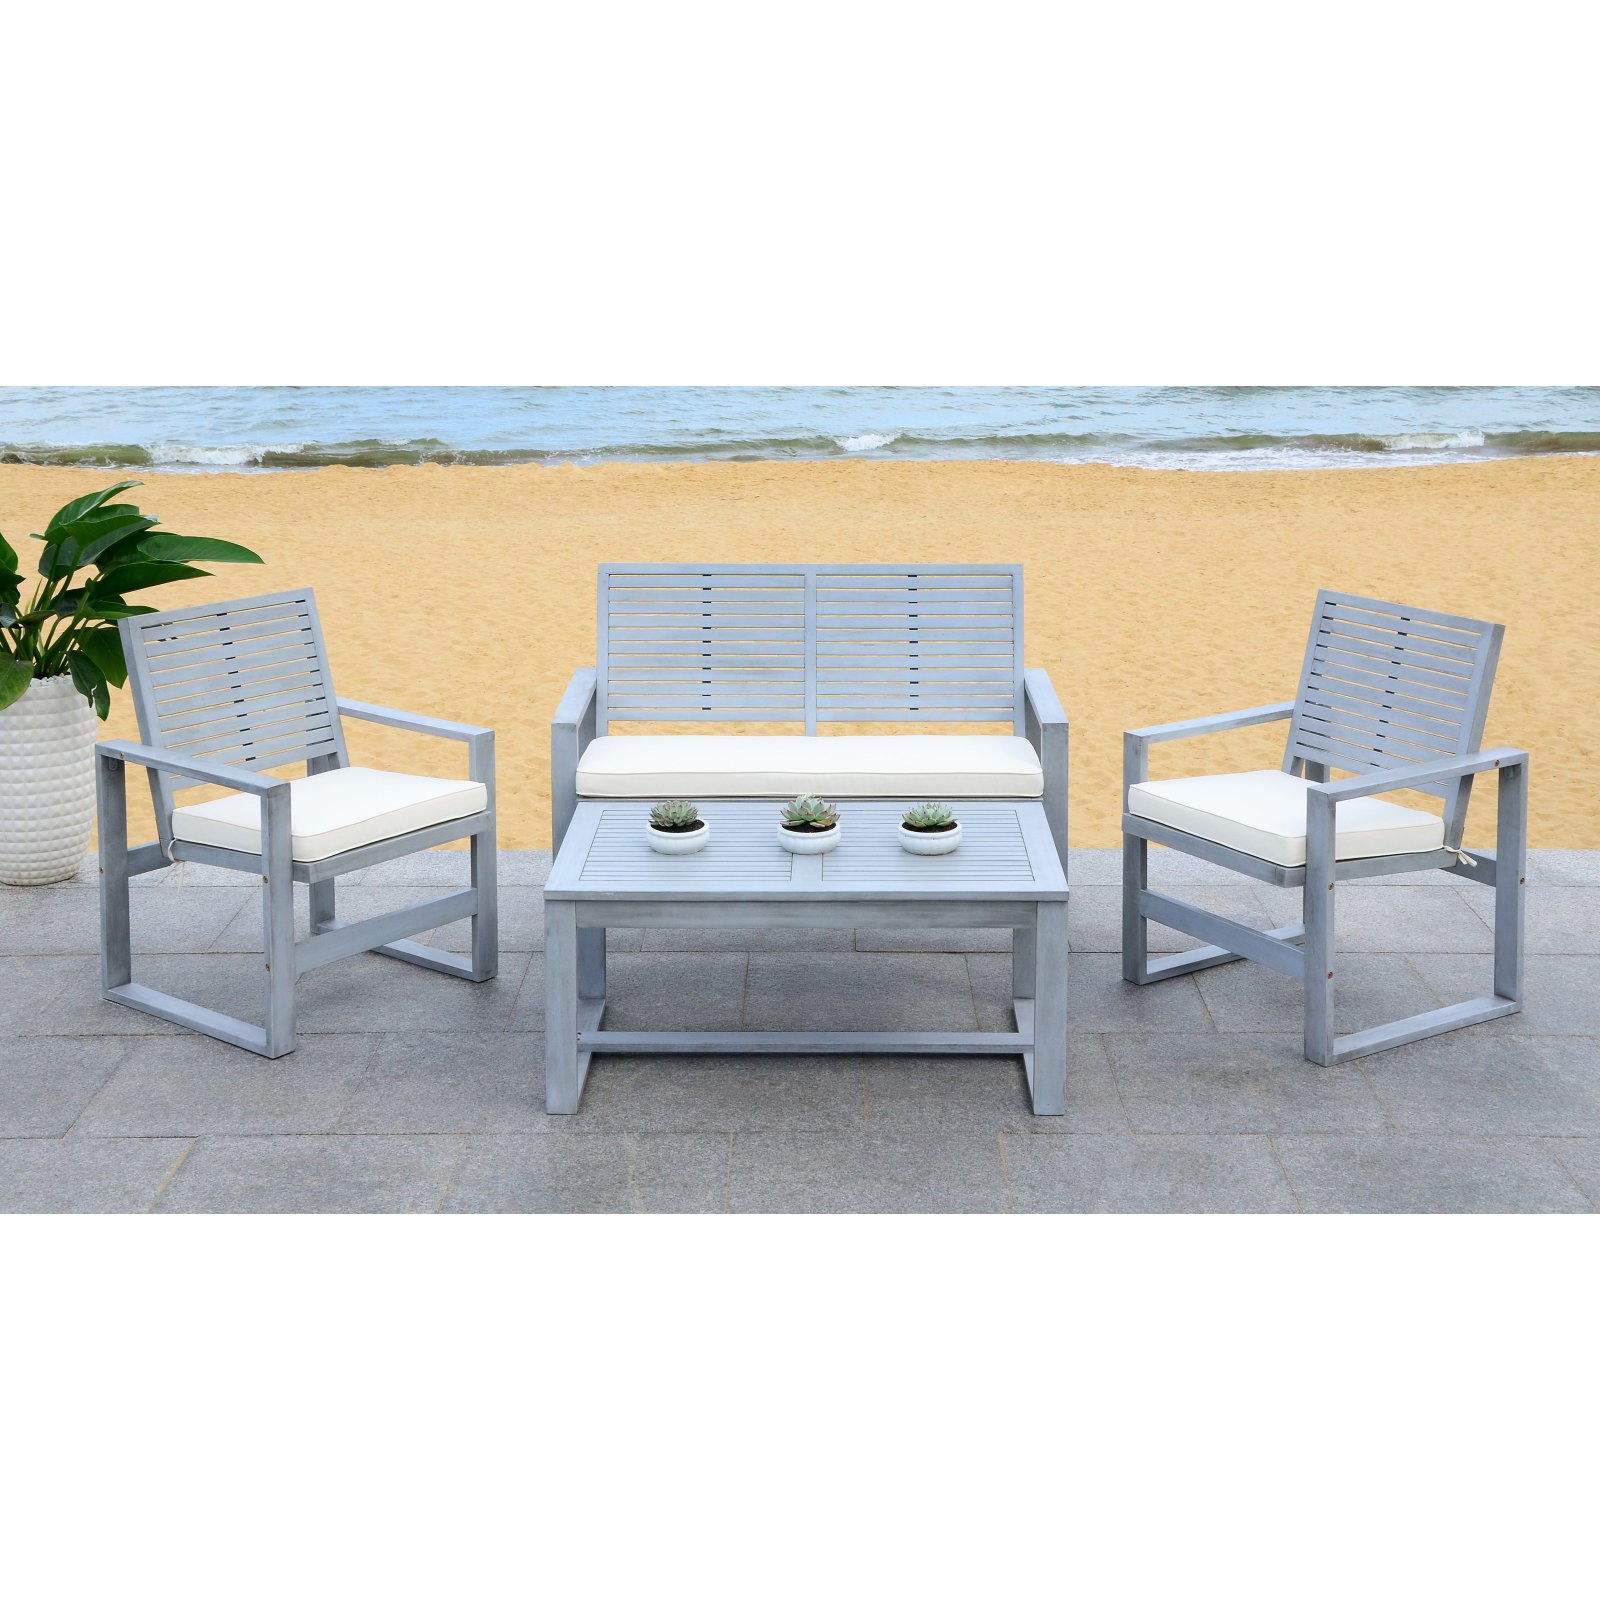 Safavieh Ozark Indoor/Outdoor Contemporary 4 Piece Living Set